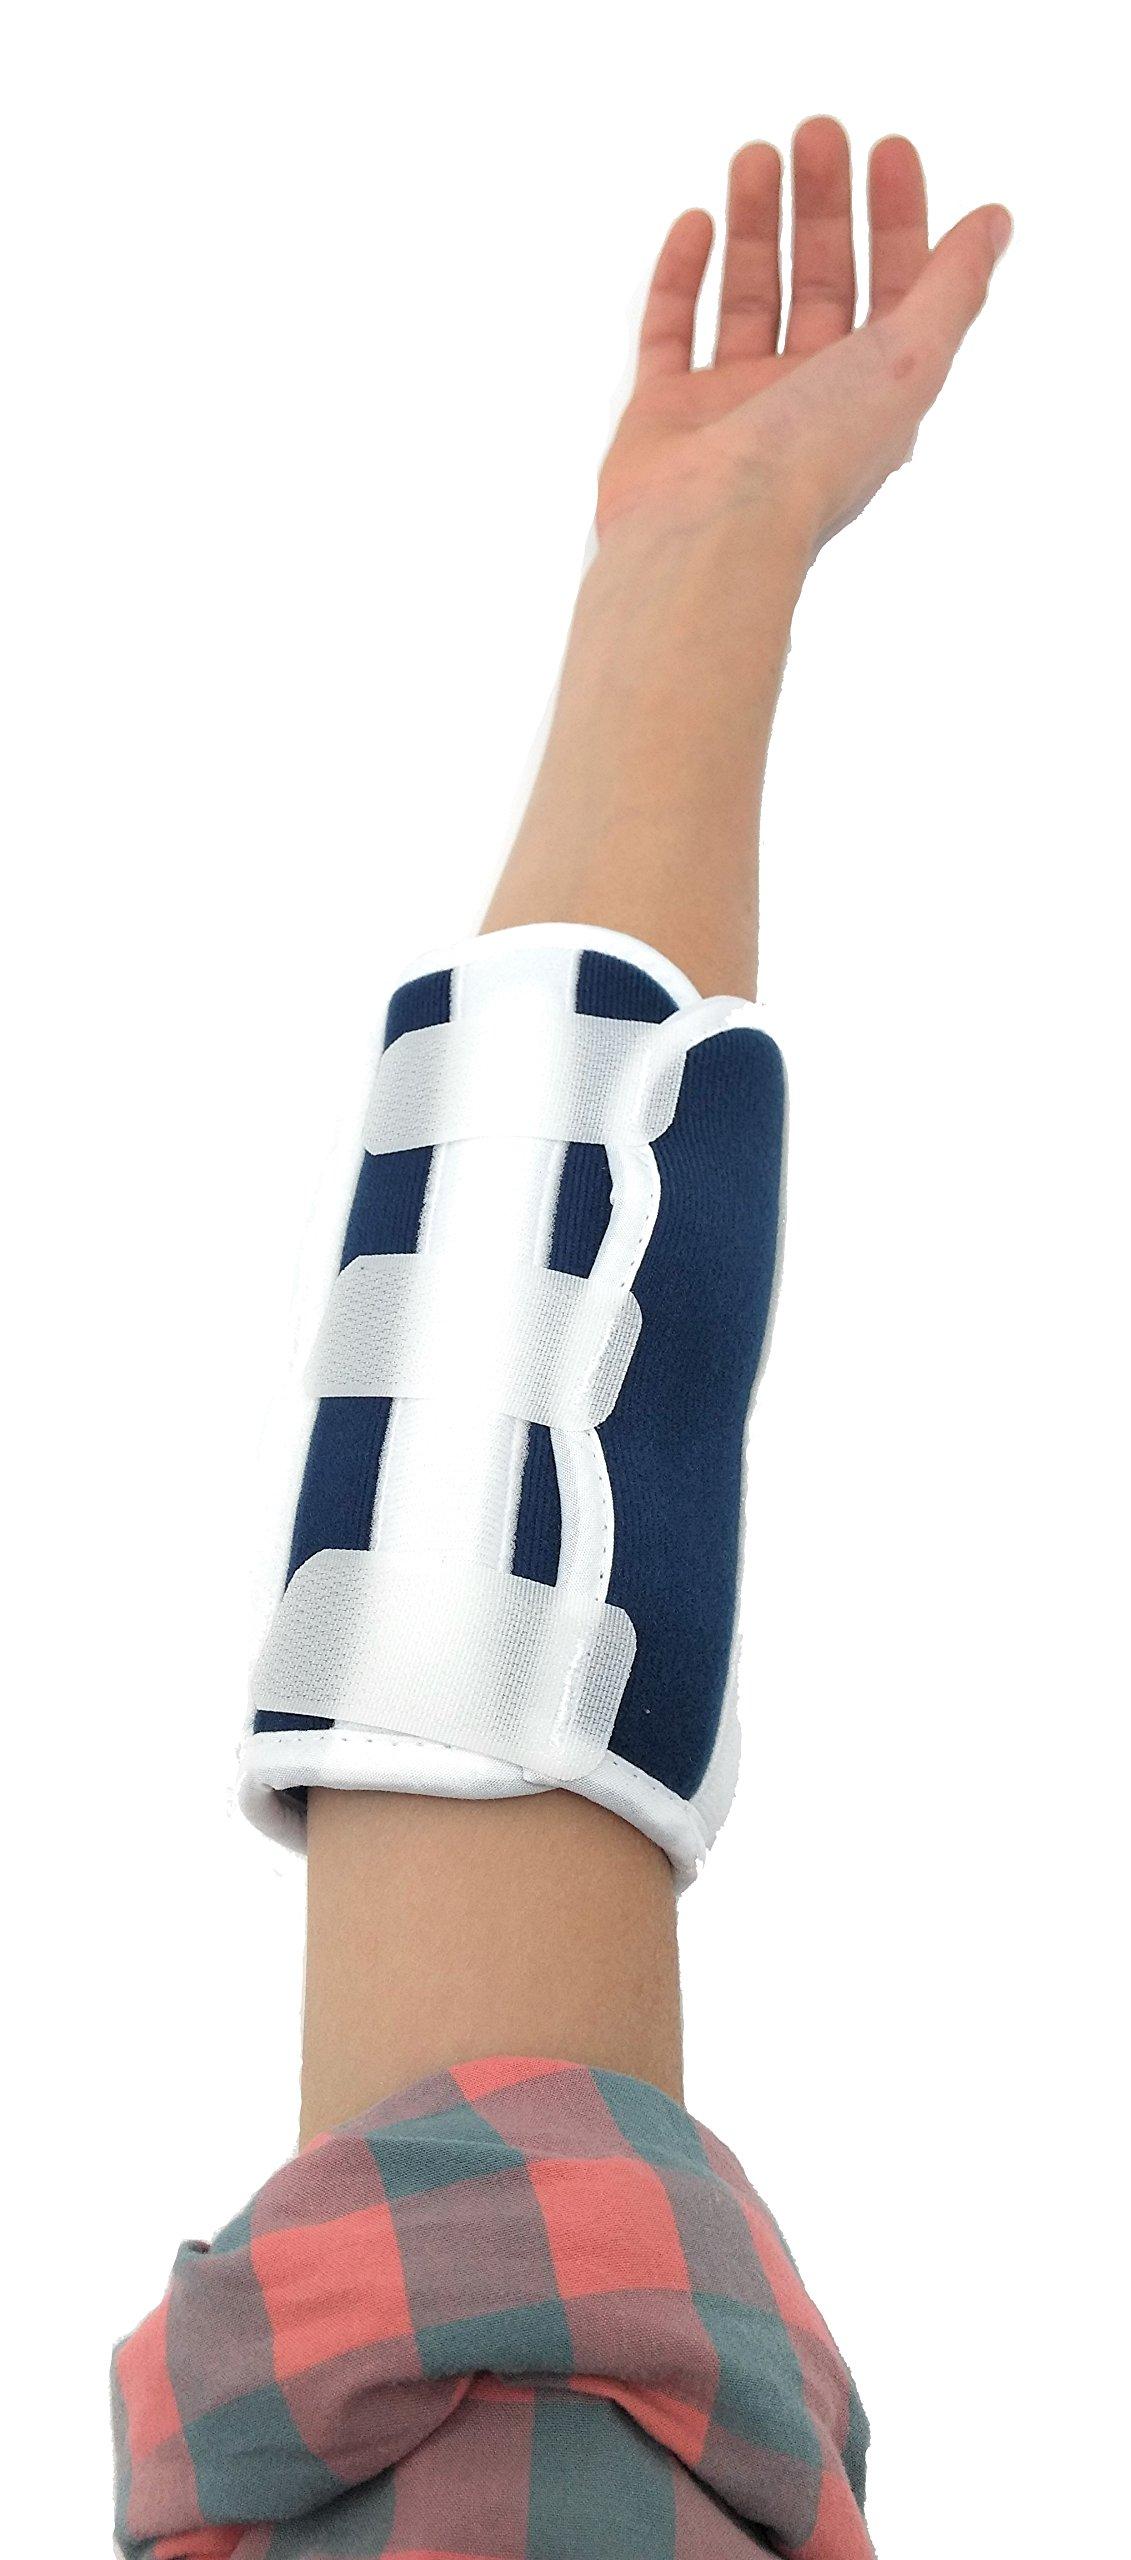 Premium Pediatric Child Elbow Immobilizer Stabilizer Splint/Arm Restraint - Toddler/Kids